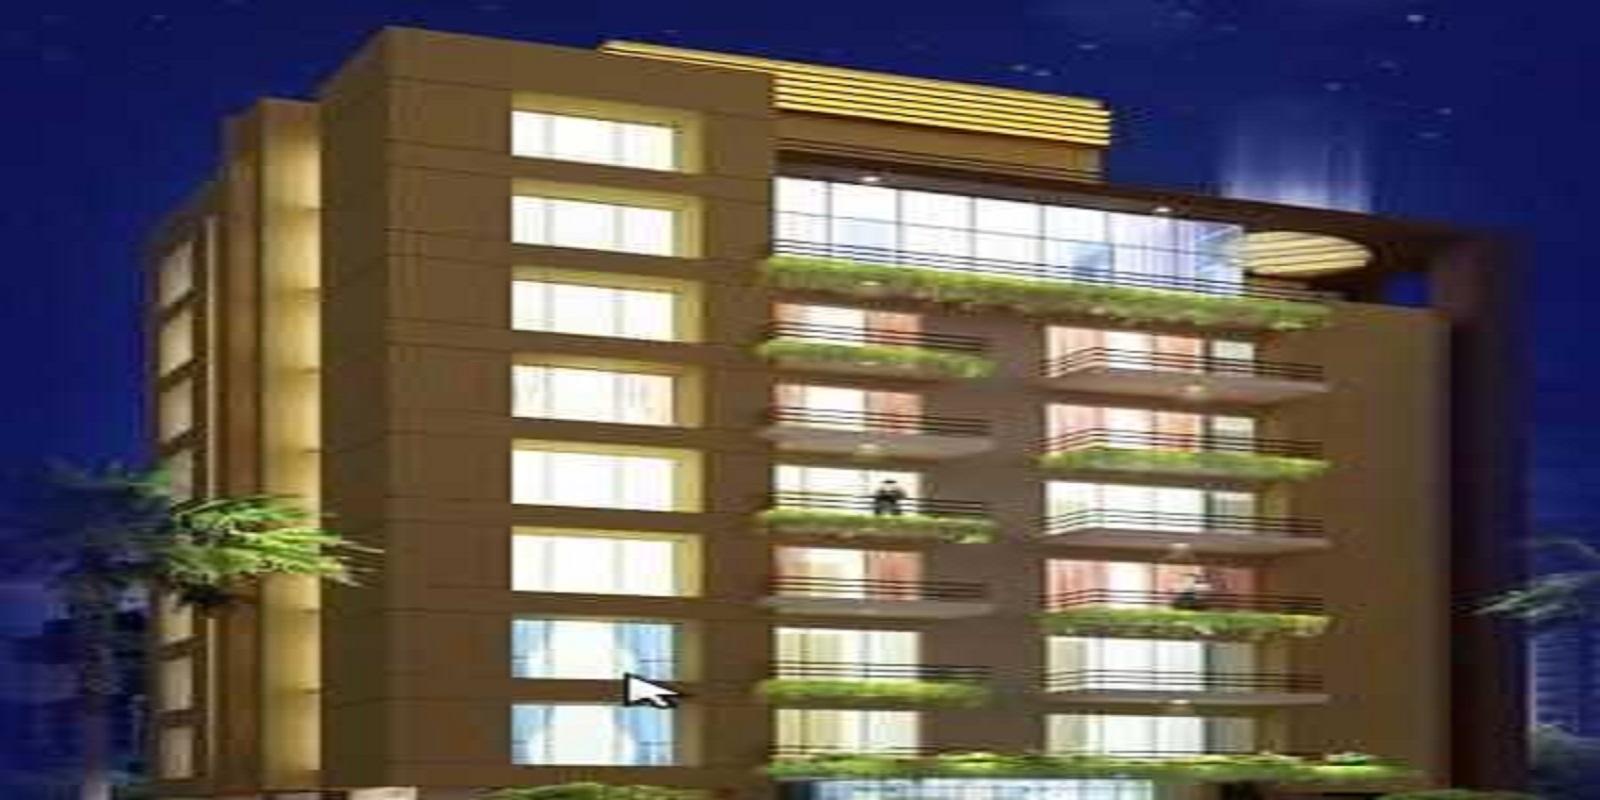 kanakia eternity apartments project project large image1